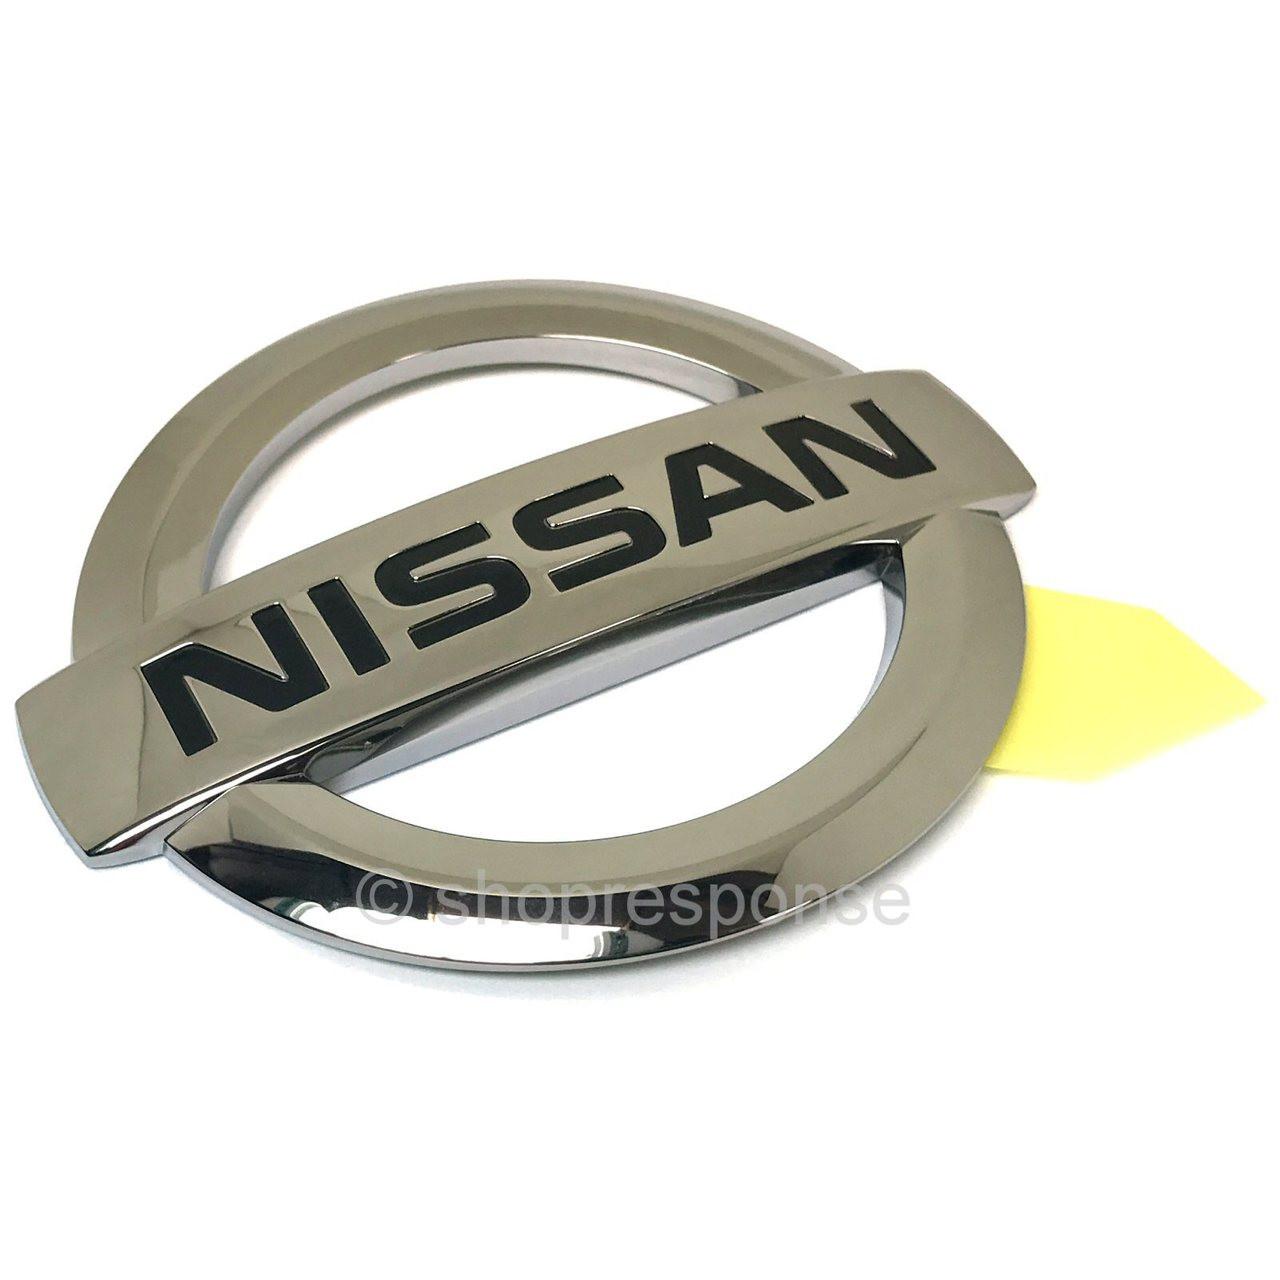 nissan_gtr_r35_rear_nissan_emblem_1__705